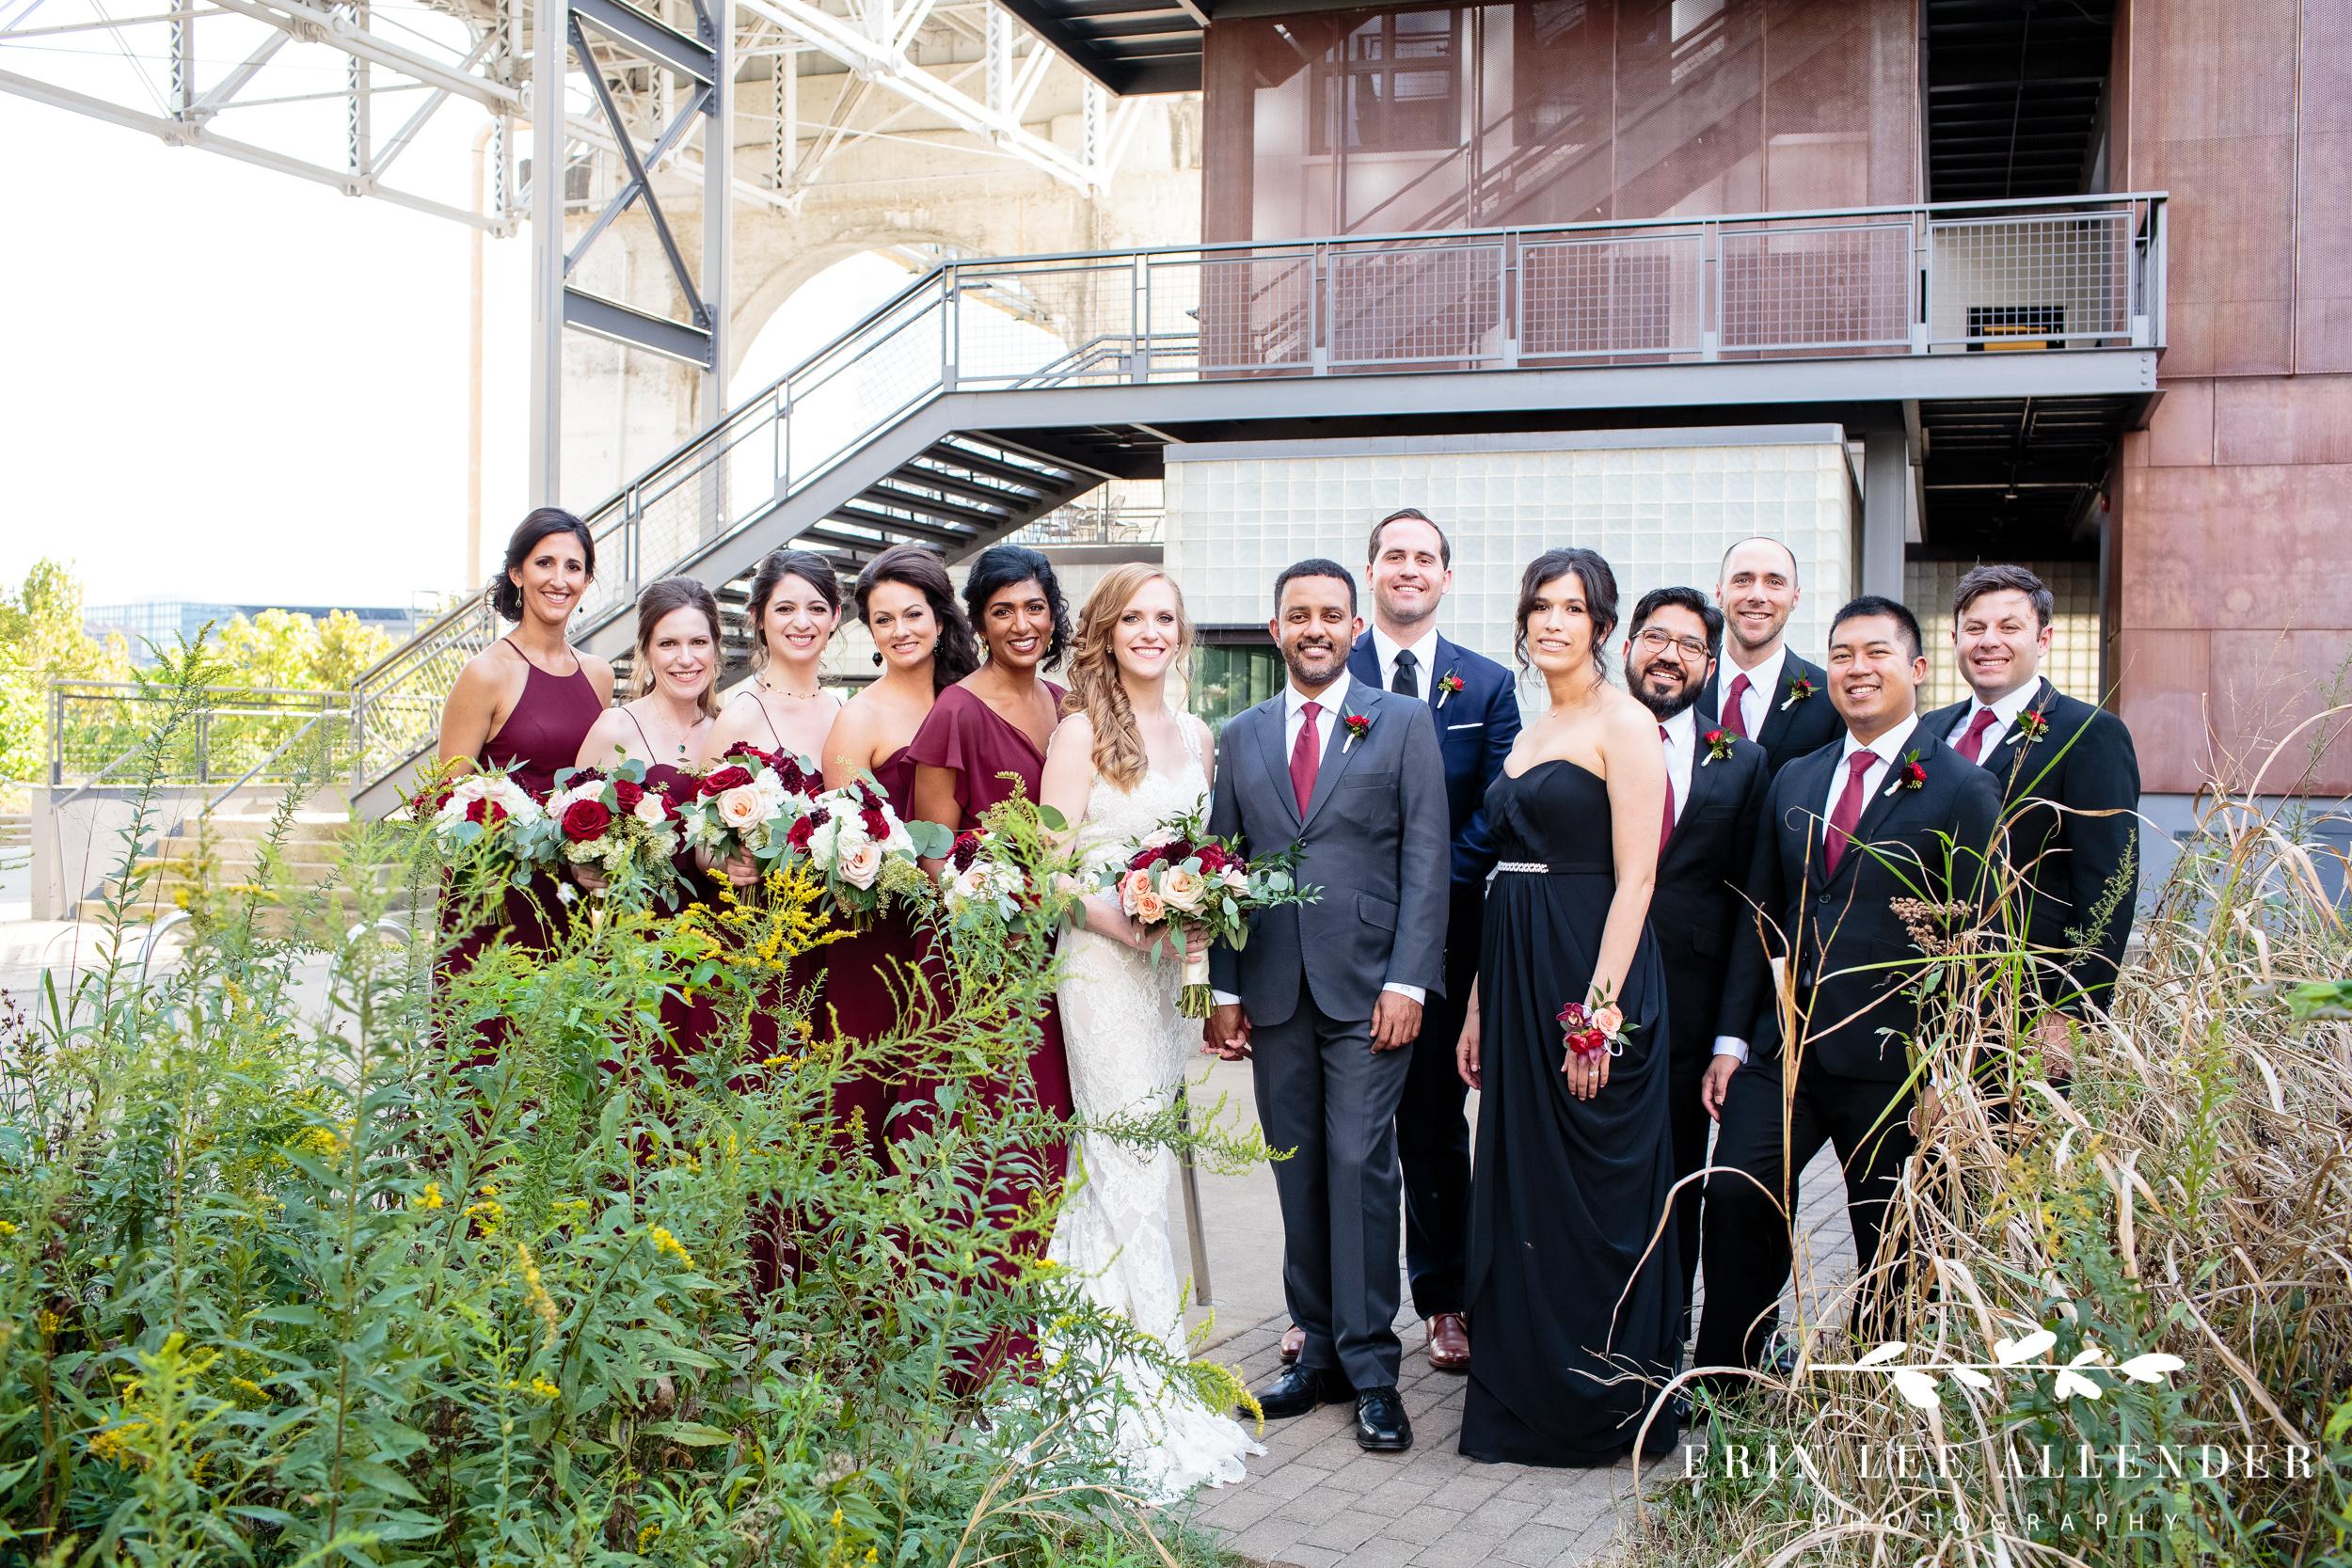 Wedding-party-photograph